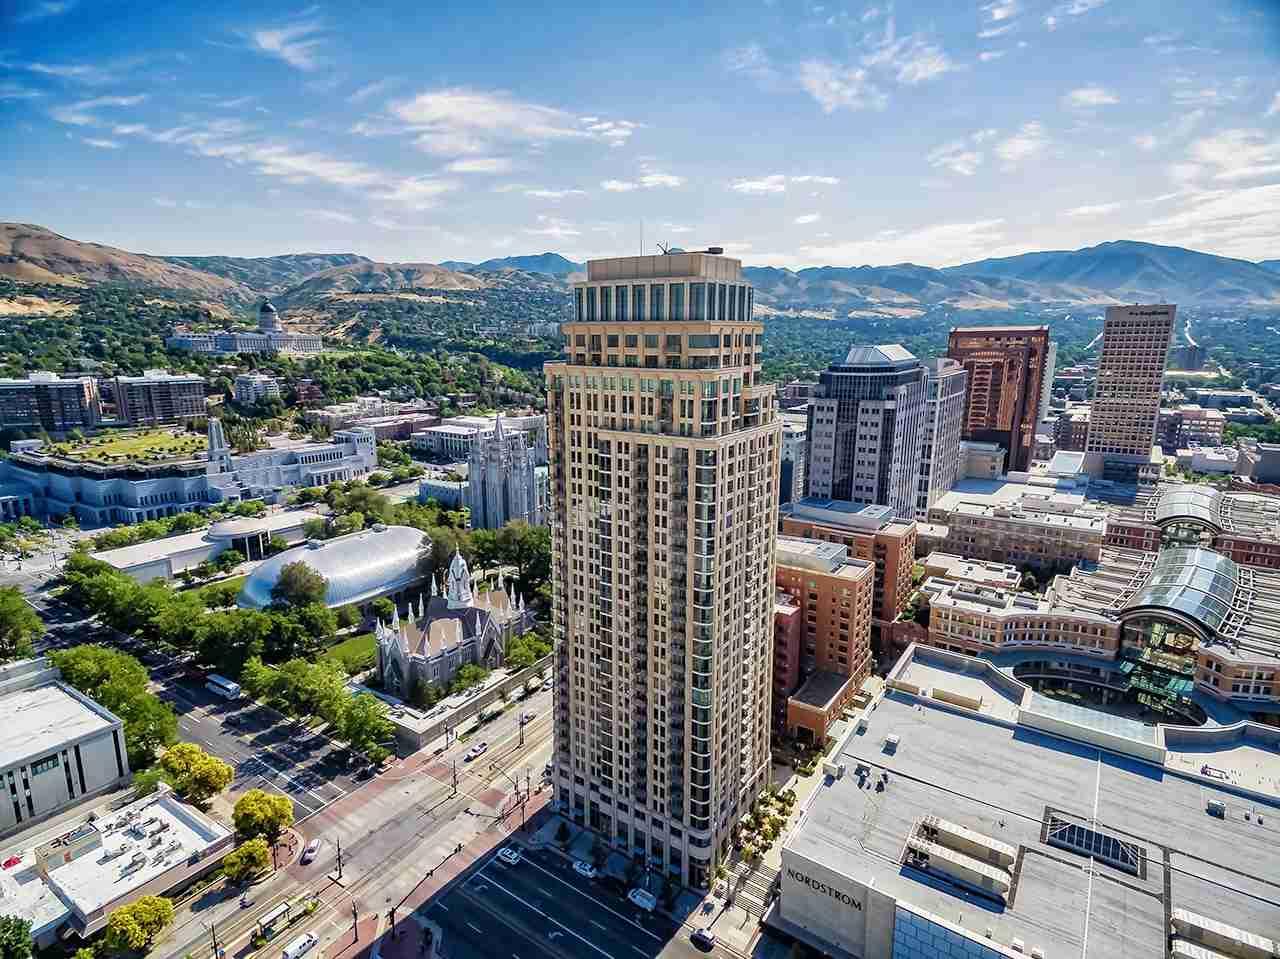 Have you been to Salt Lake City, Utah? (Photo by @keithmholland via Twenty20)